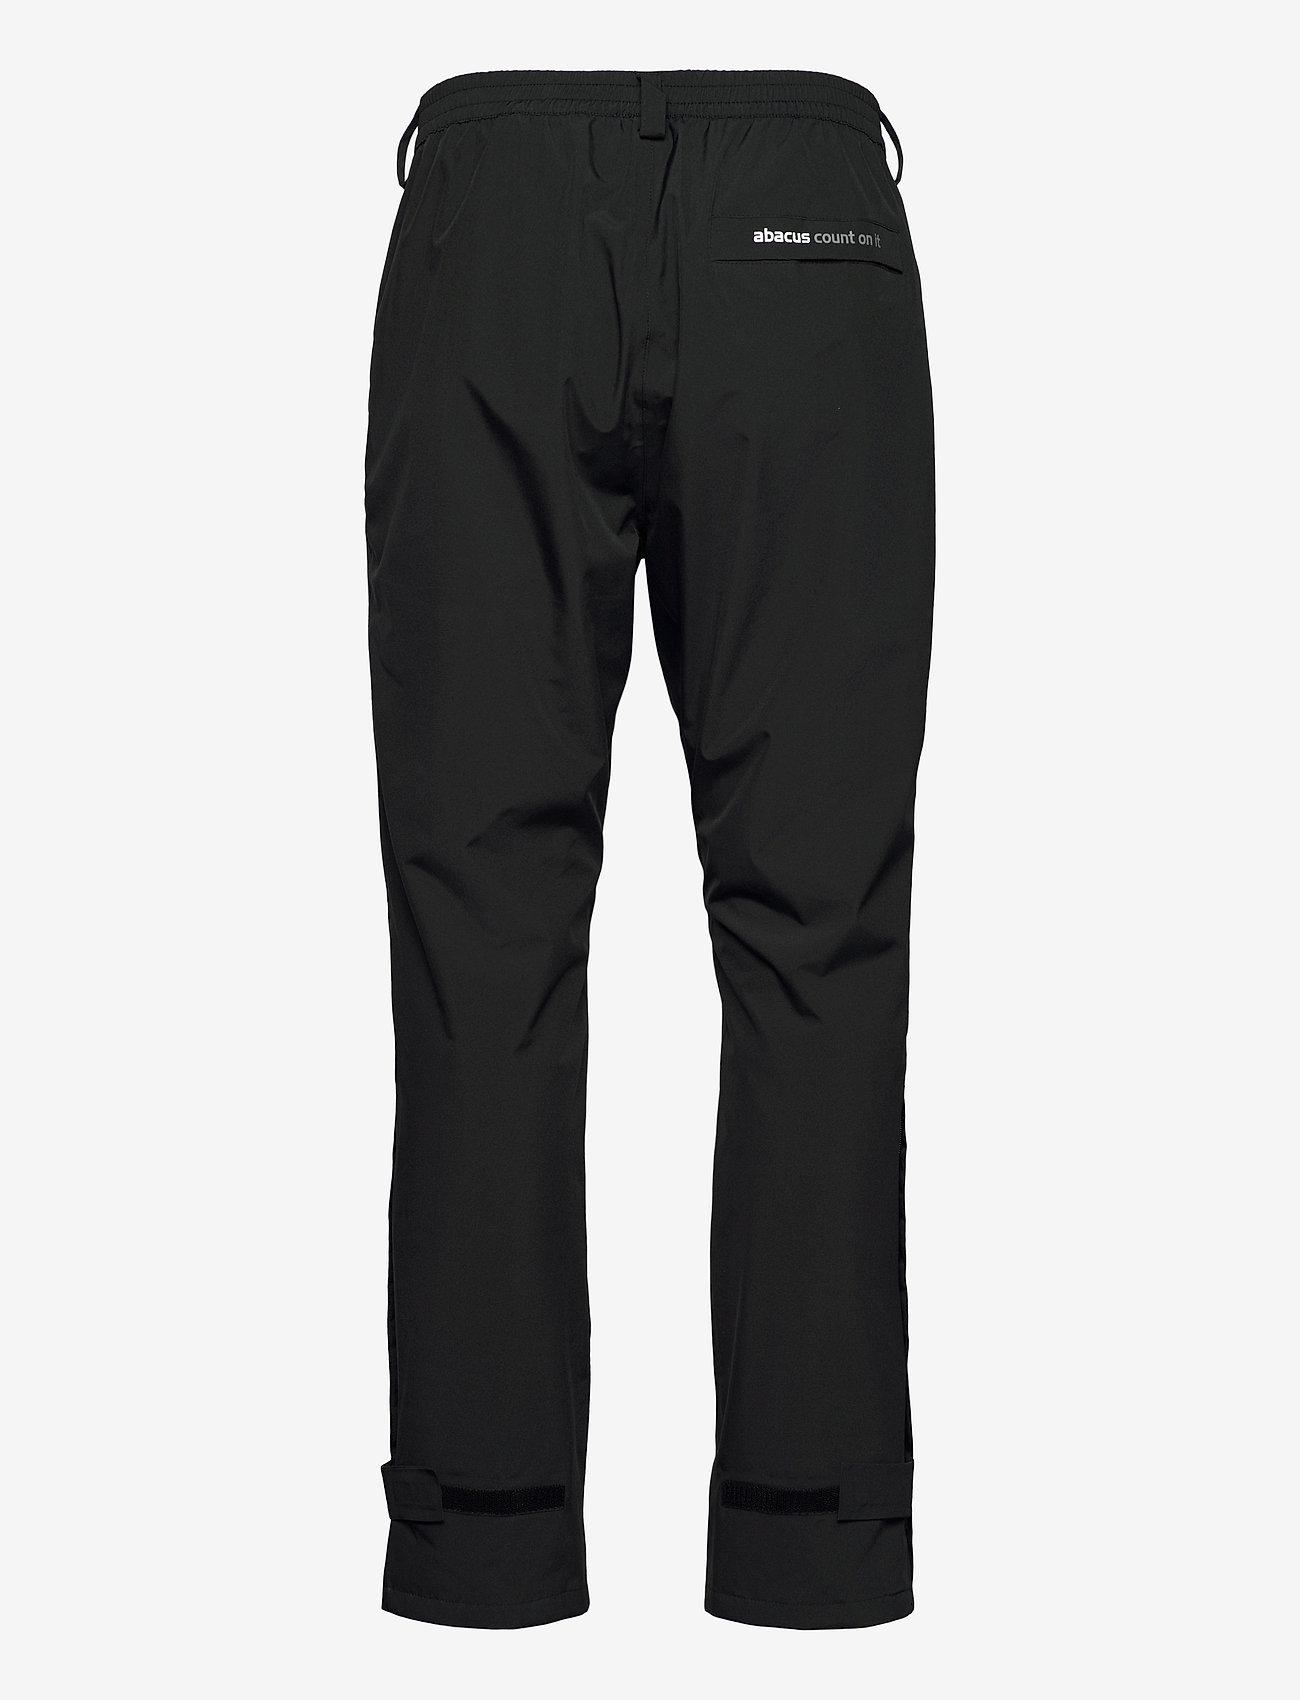 Abacus - Mens Links raintrousers - golf-housut - black - 1